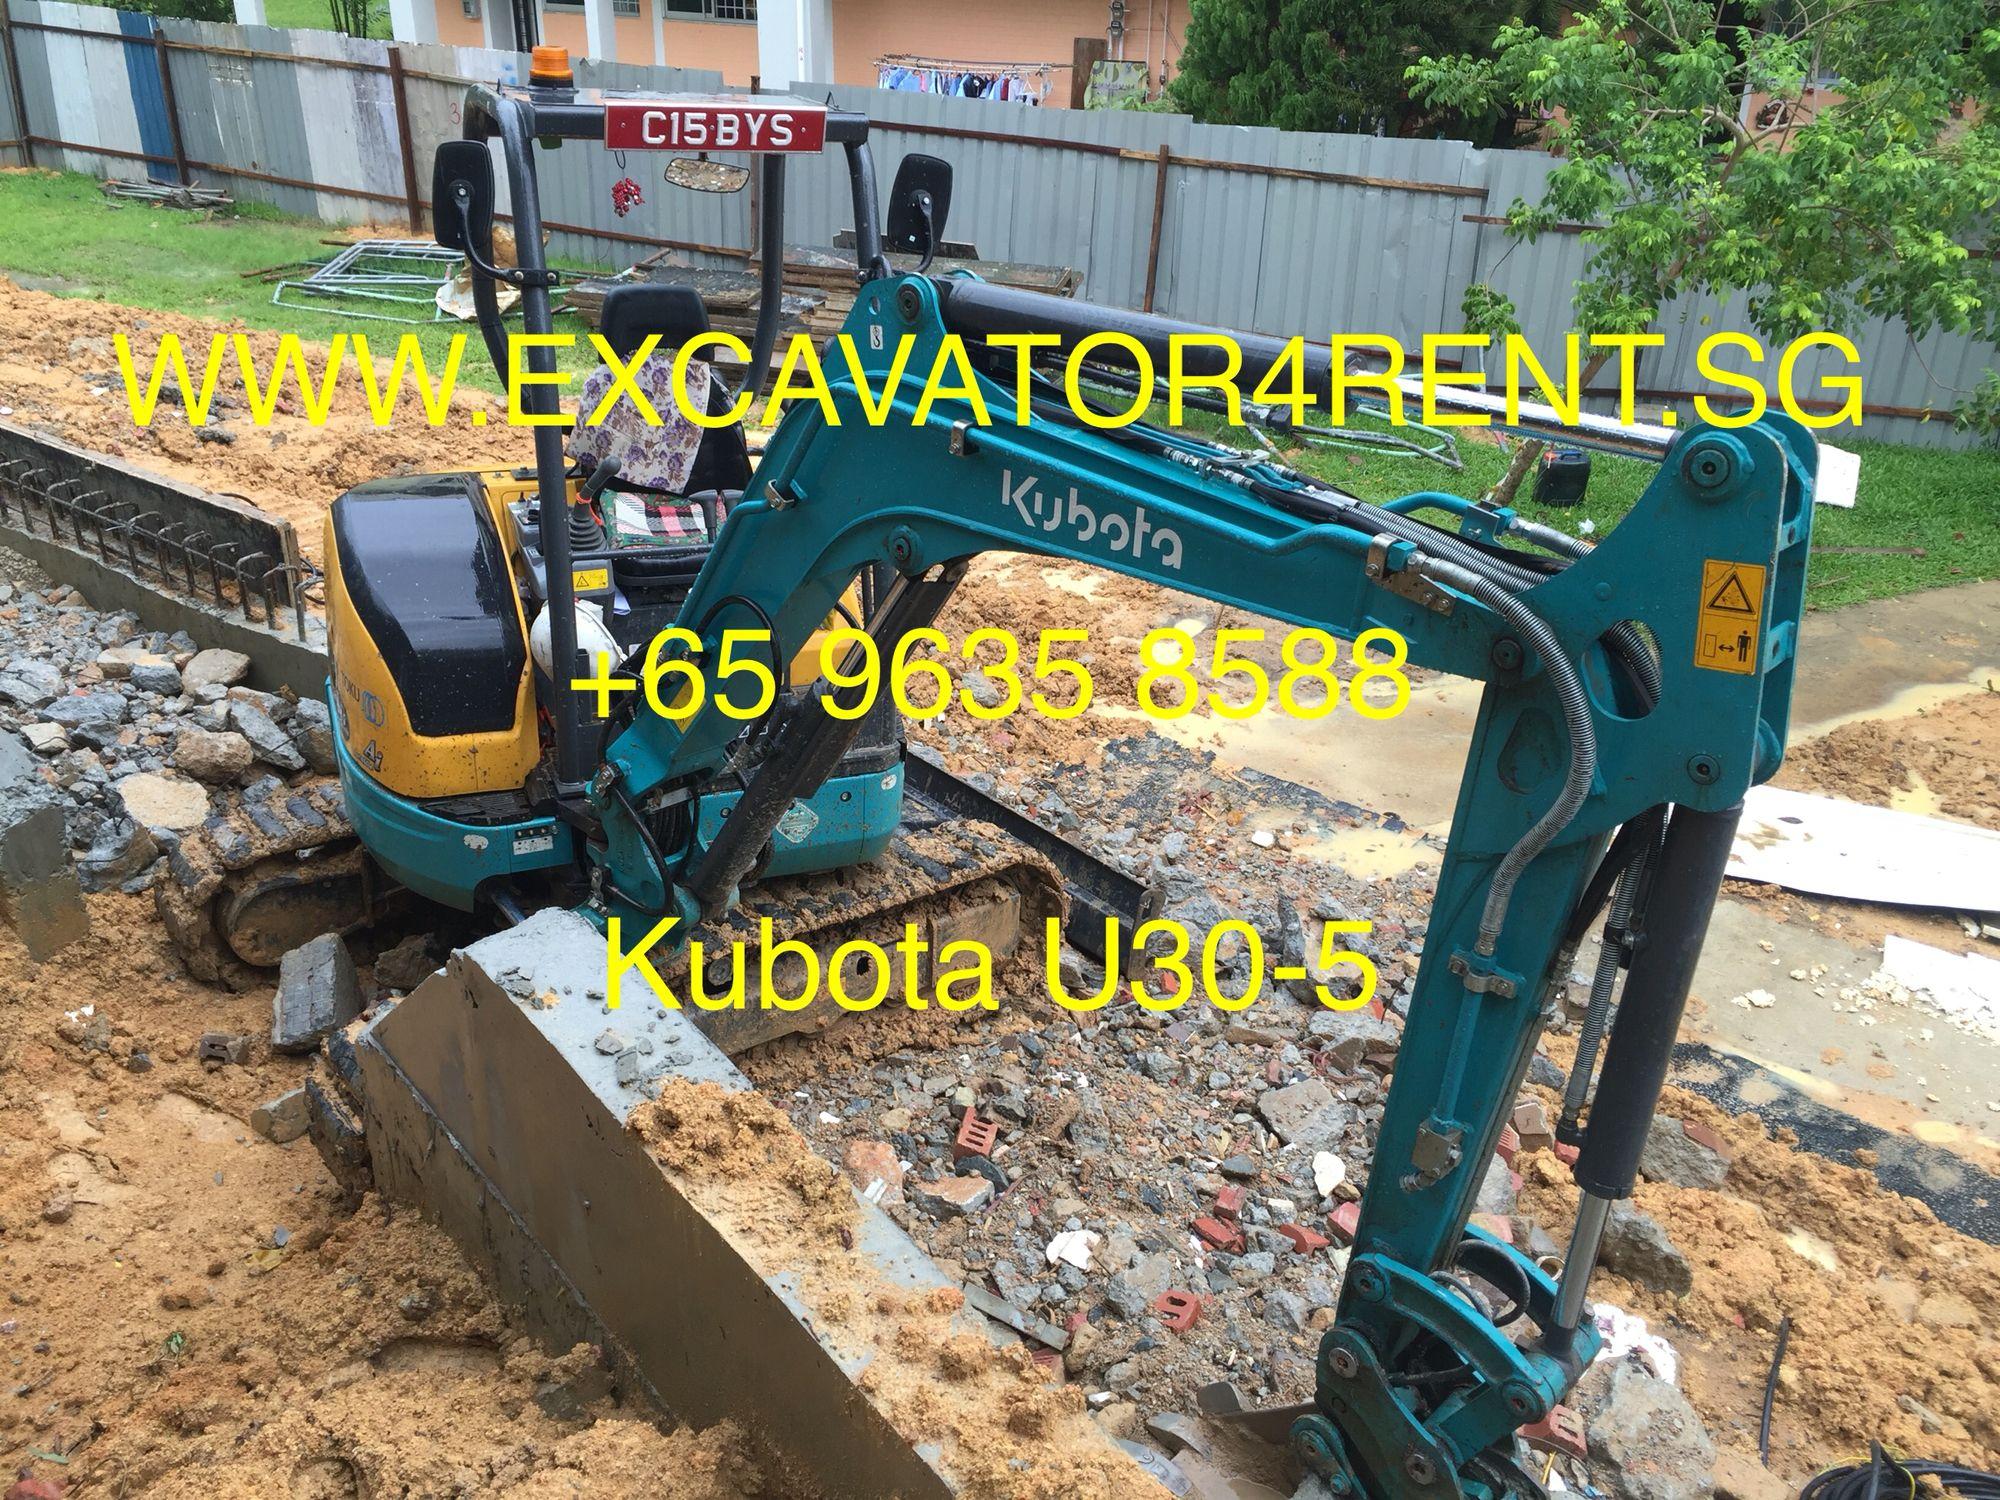 2015 Almost New 3 Ton Mini Kubota Excavator U30-5 With